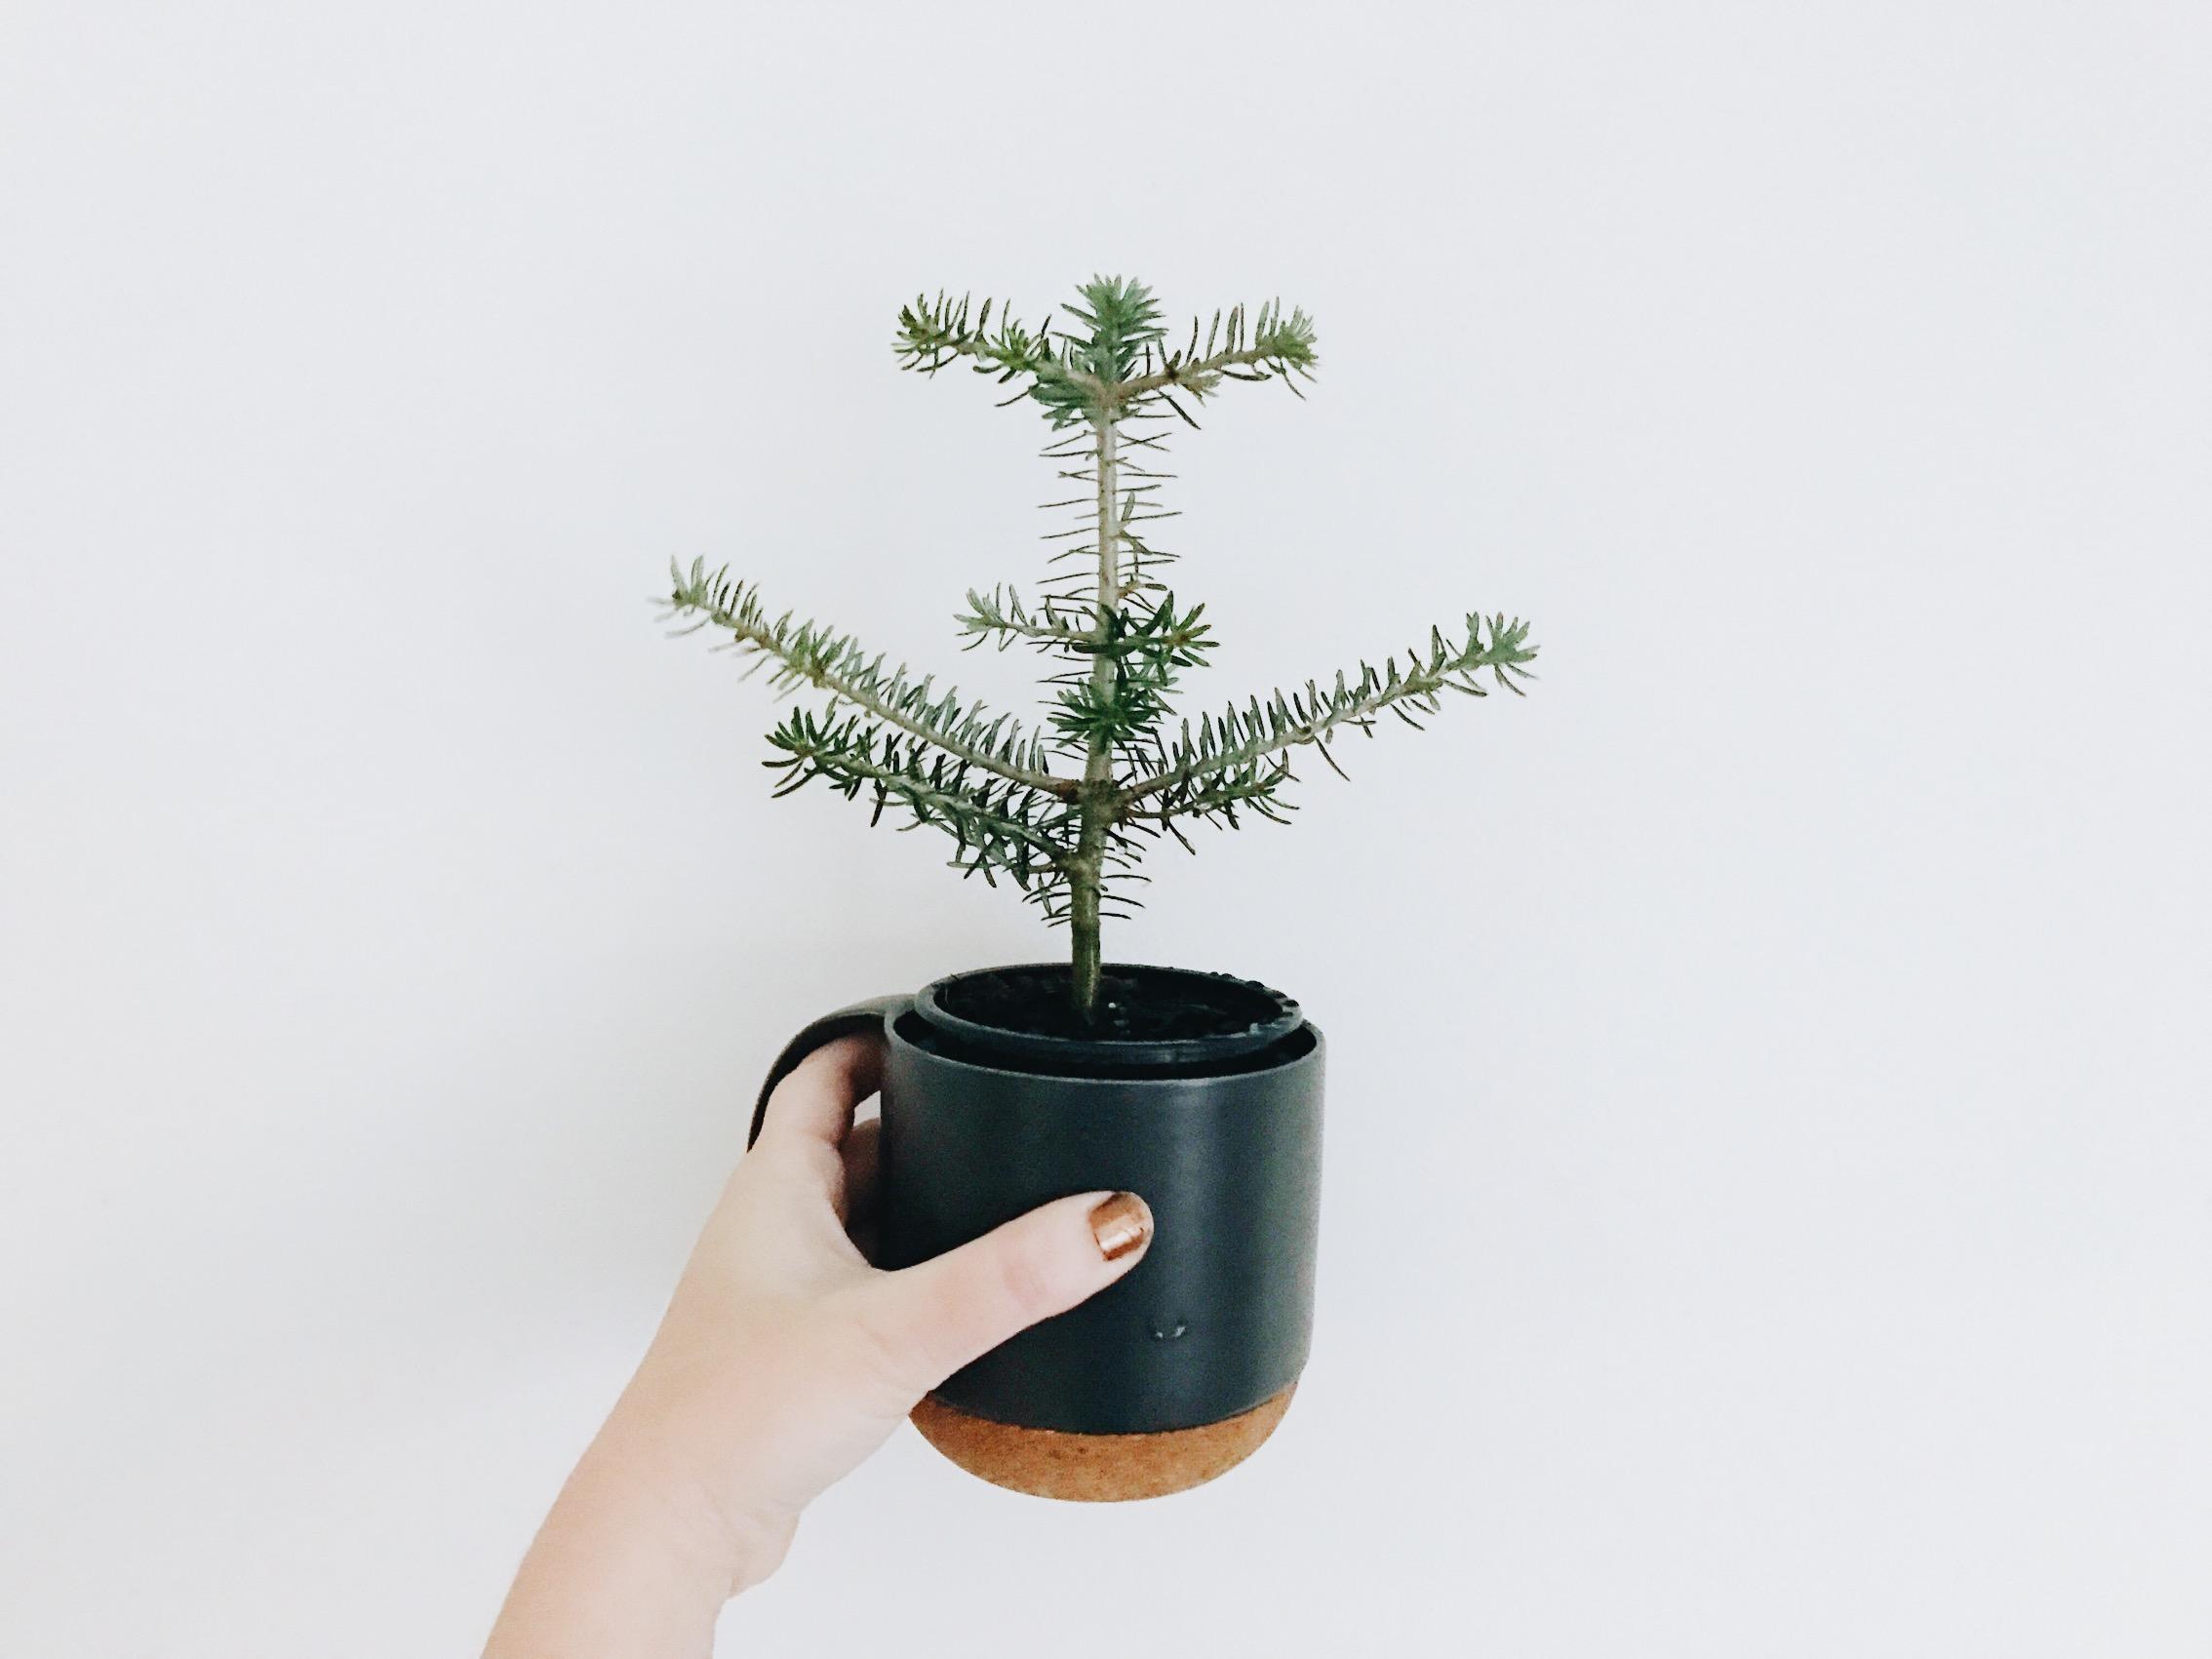 xmas christmas tree plant